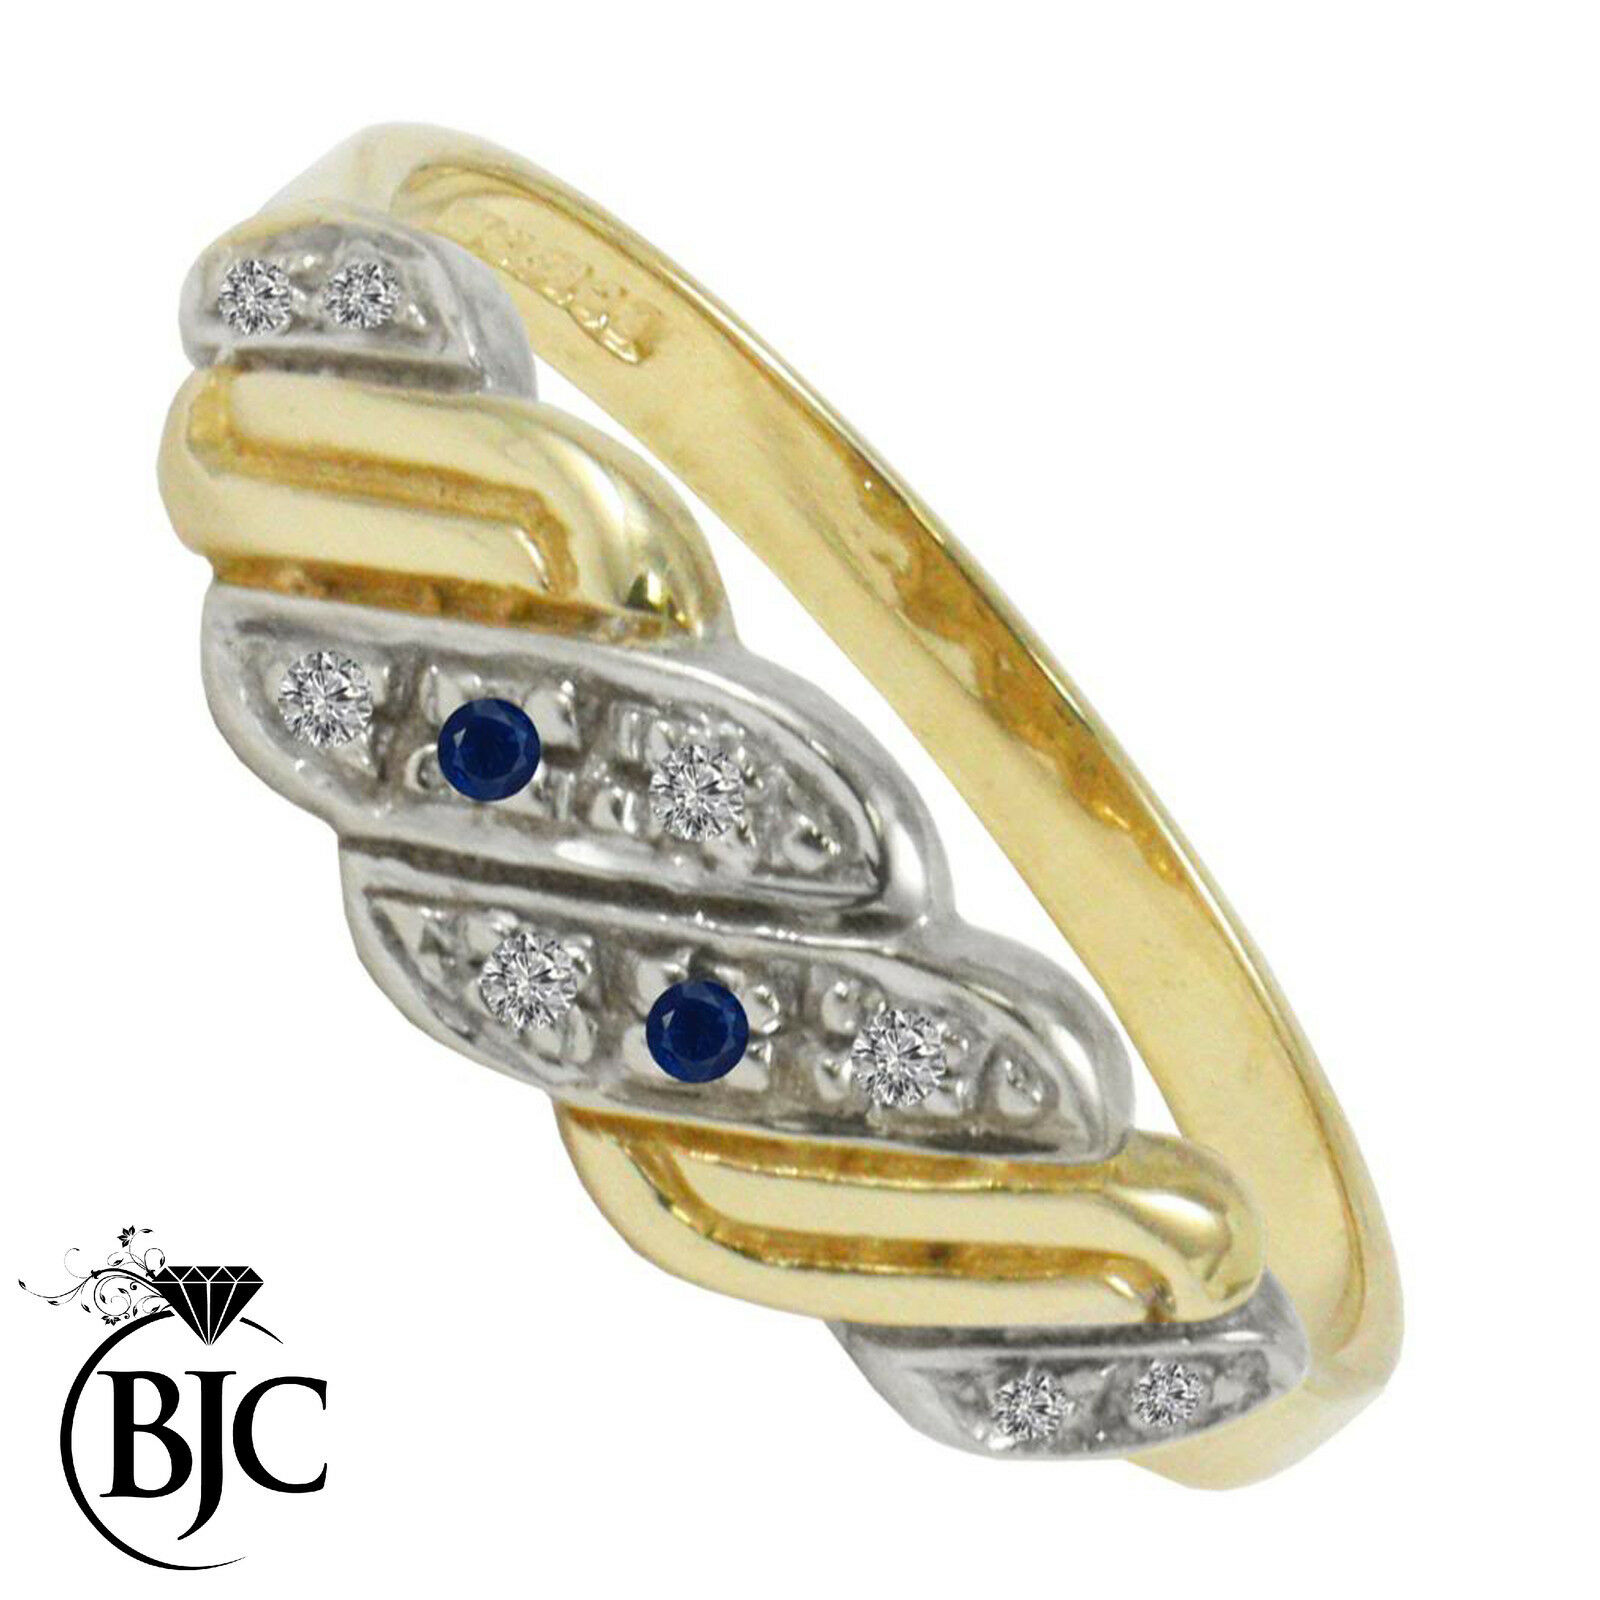 Bjc 9Ct gold yellow Zafiro y Diamante Gitano size M Compromiso